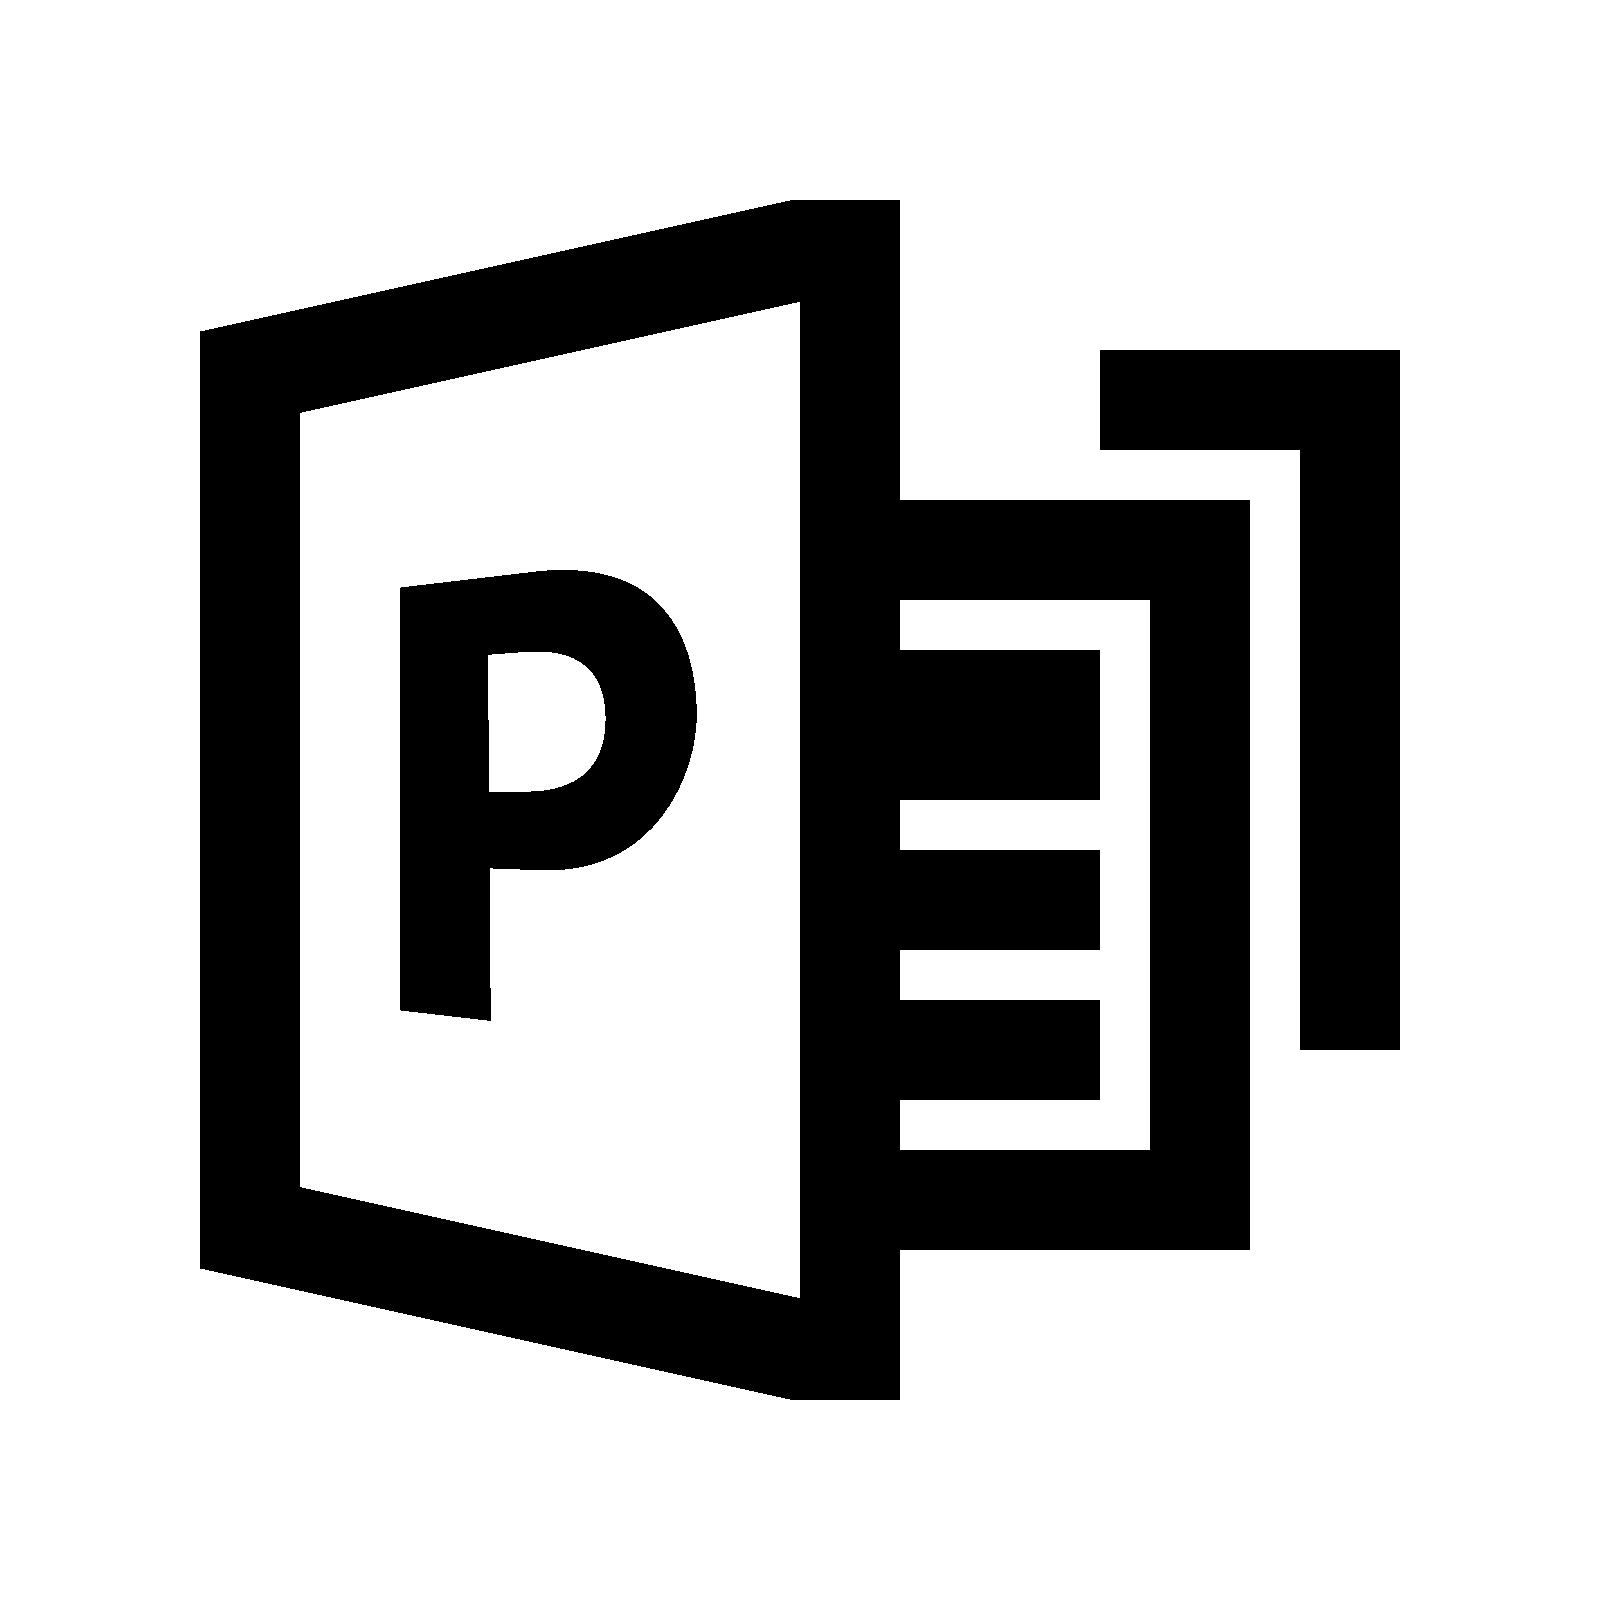 Microsoft clipart publisher microsoft. Logos